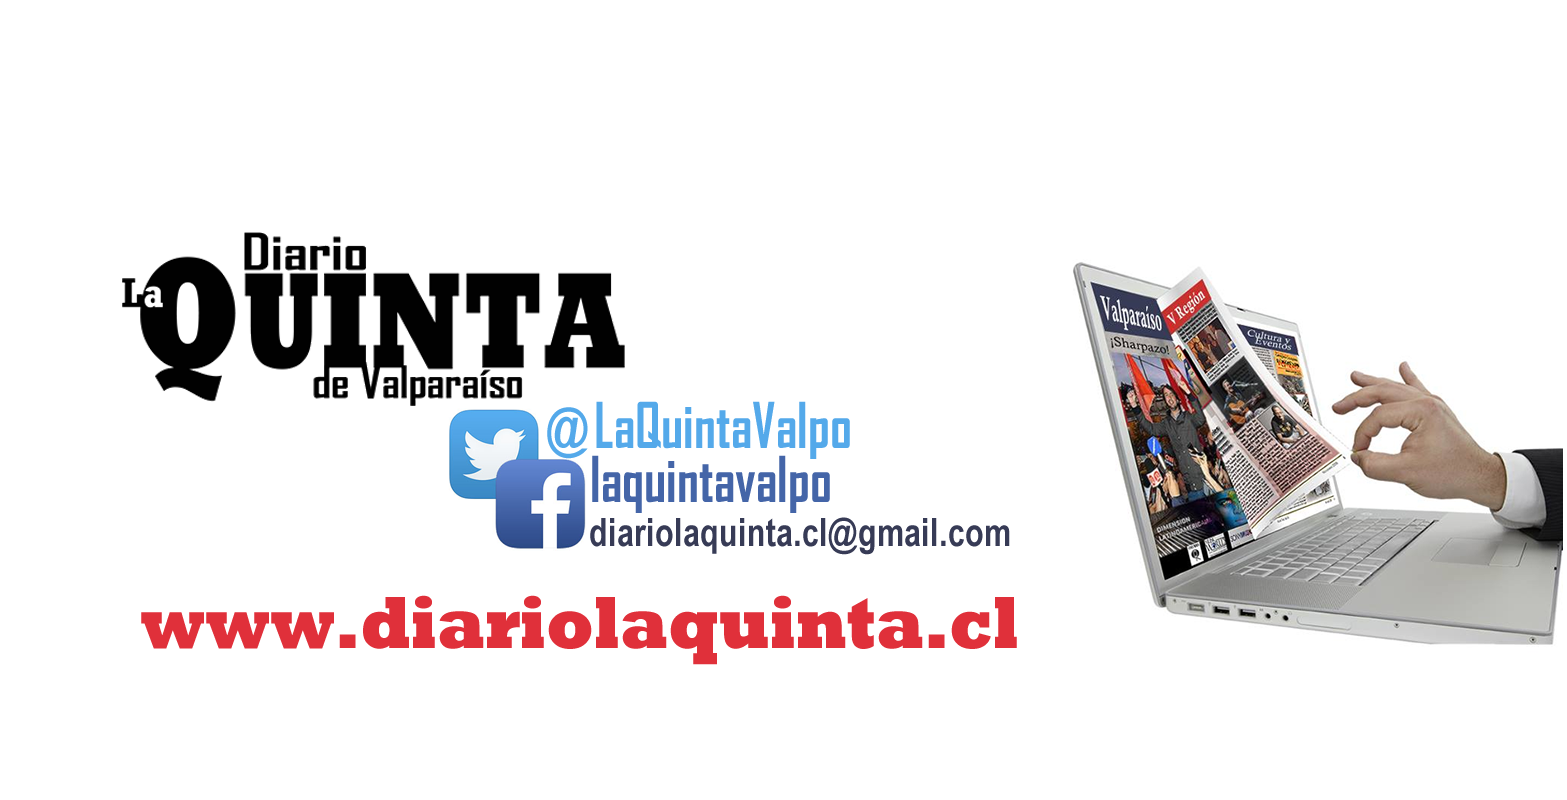 diariolaquinta.cl@gmail.com